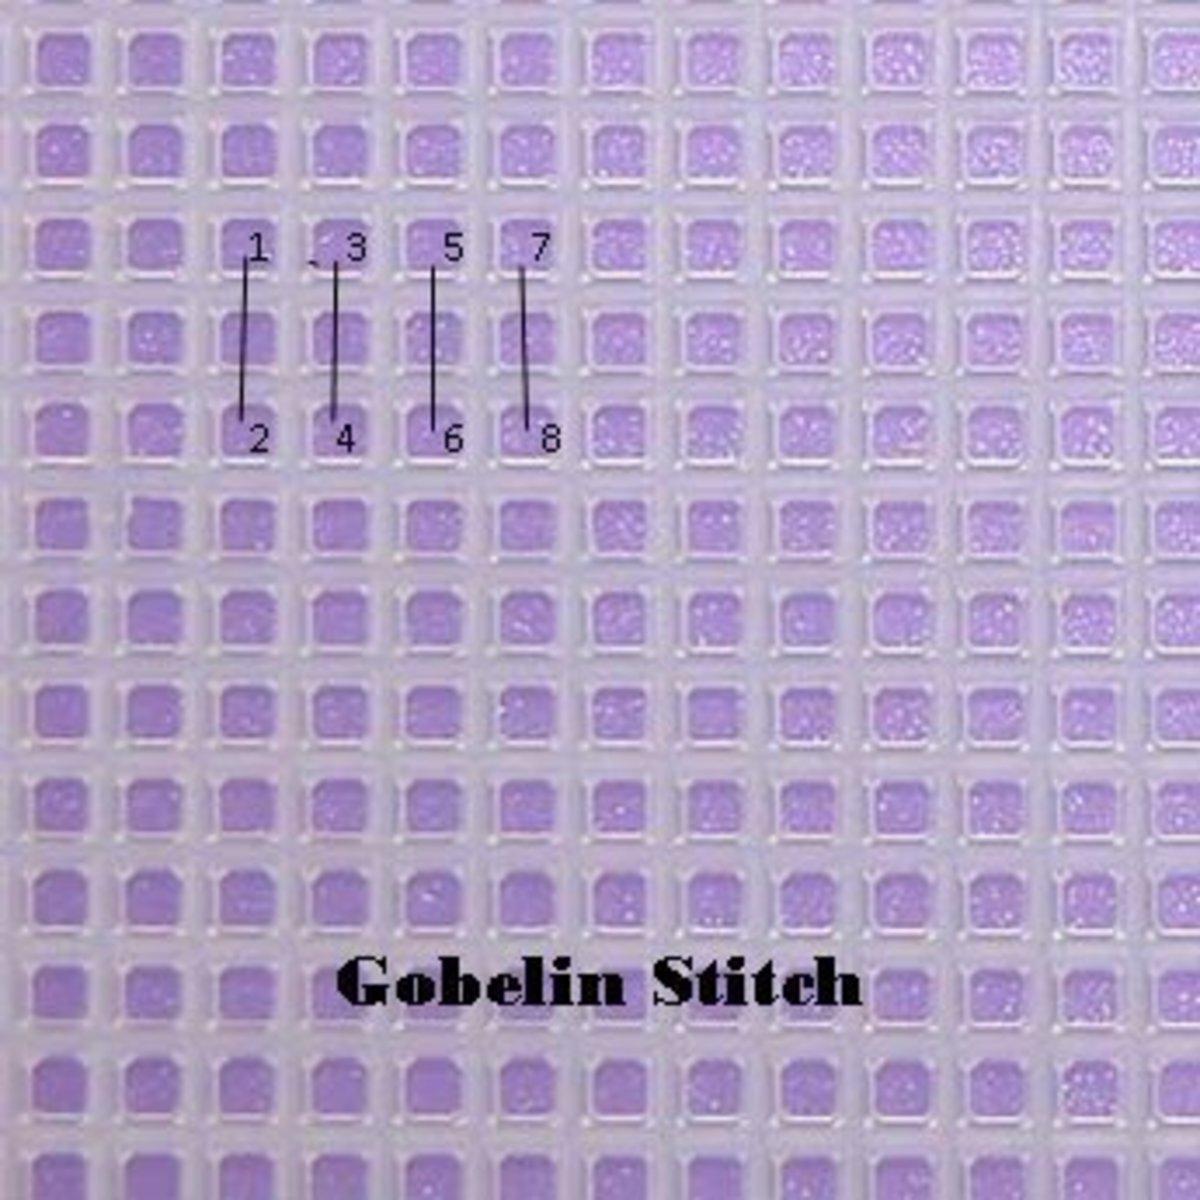 Gobelin Stitch